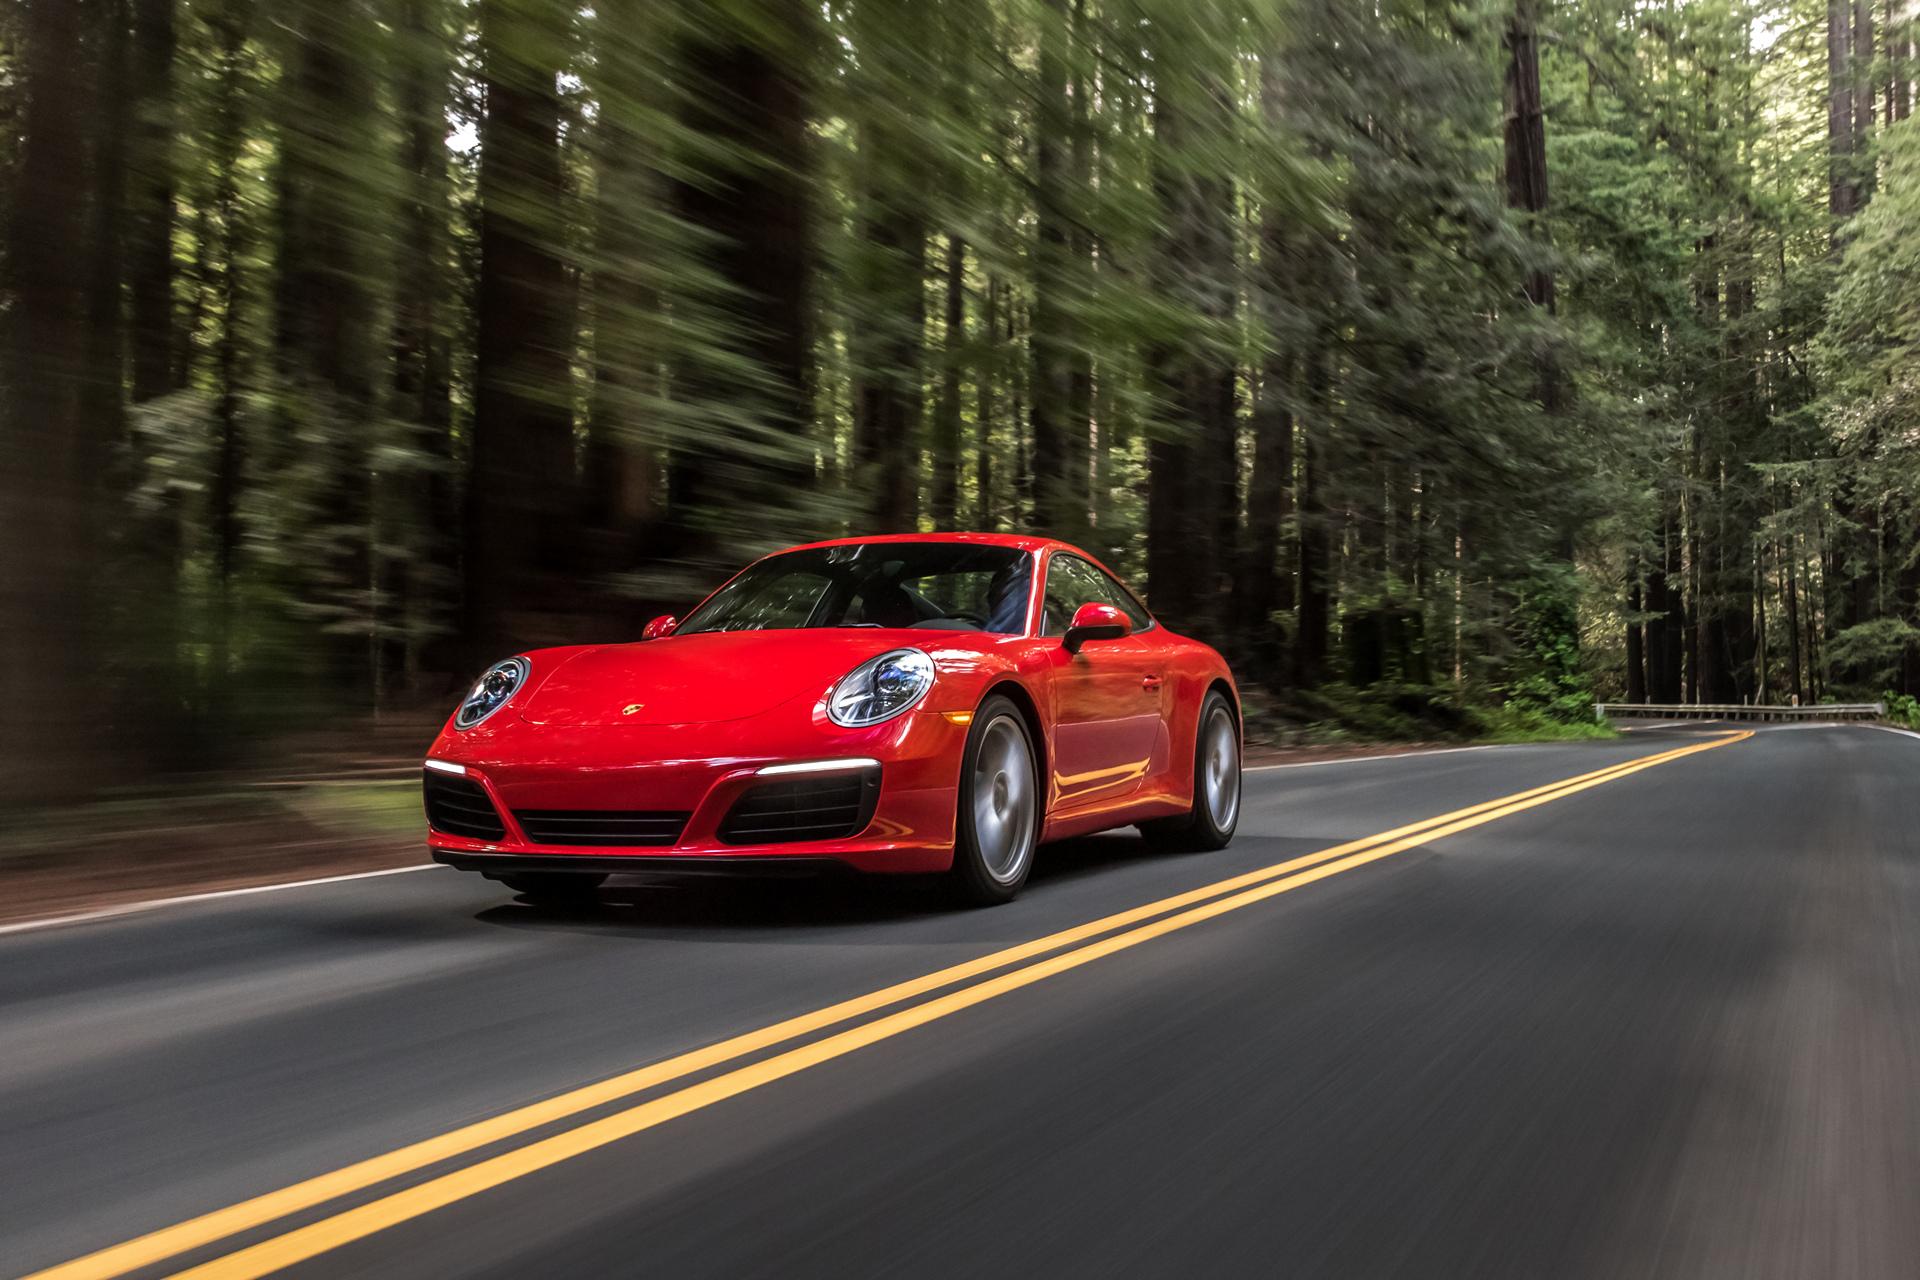 2017 Porsche 911 Carrera © Dr. Ing. h.c. F. Porsche AG